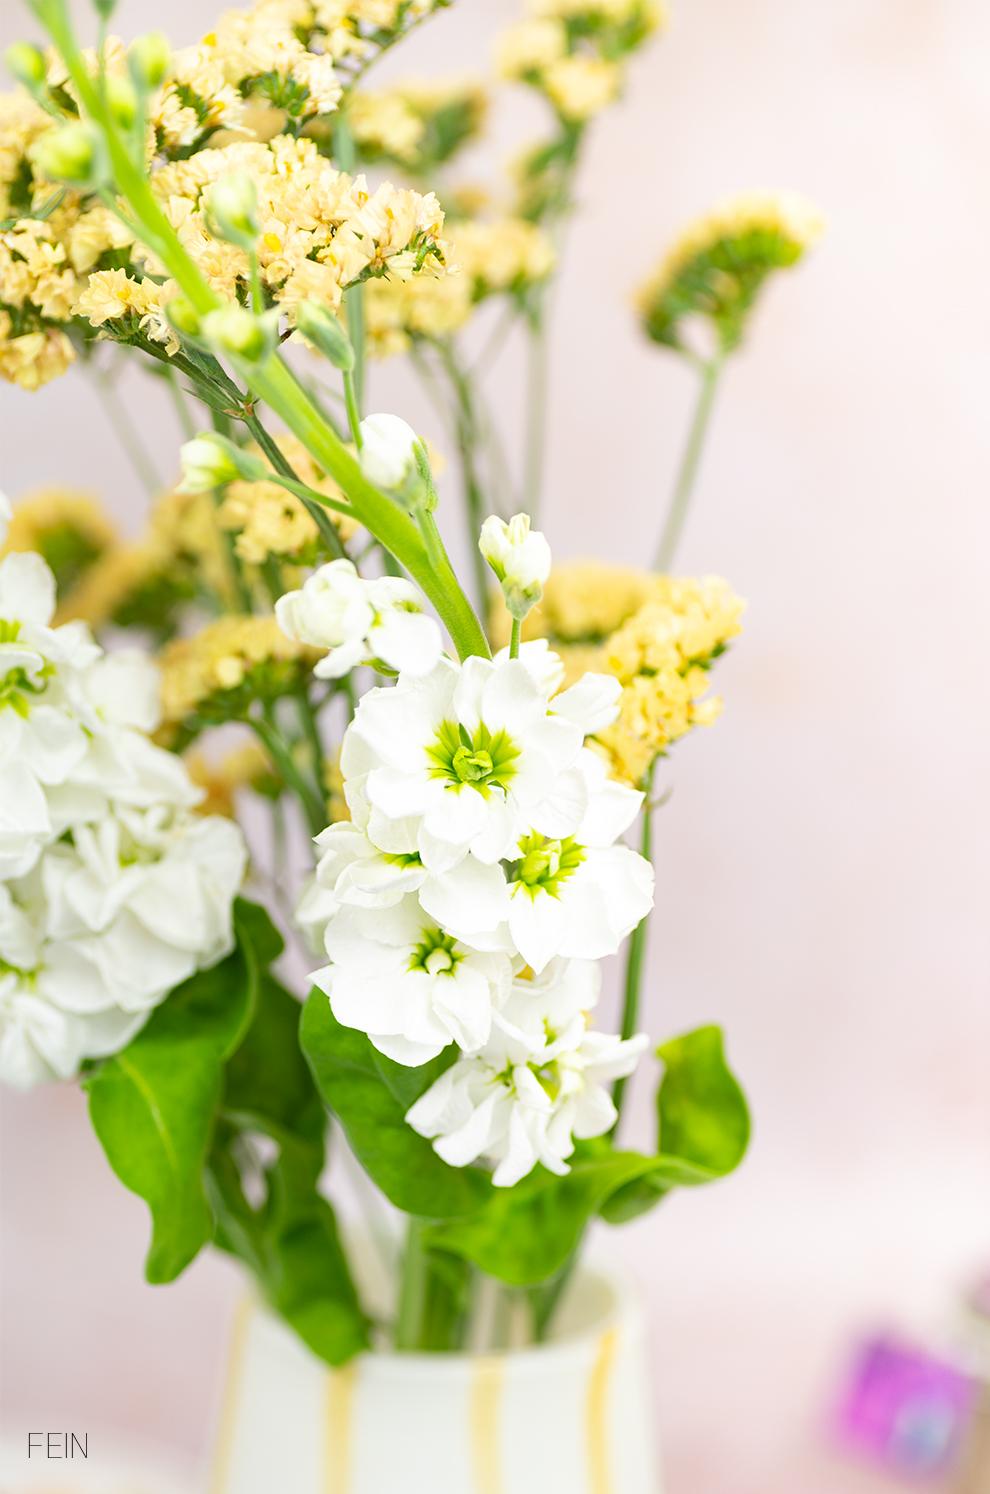 Grillen Blüten Sommer